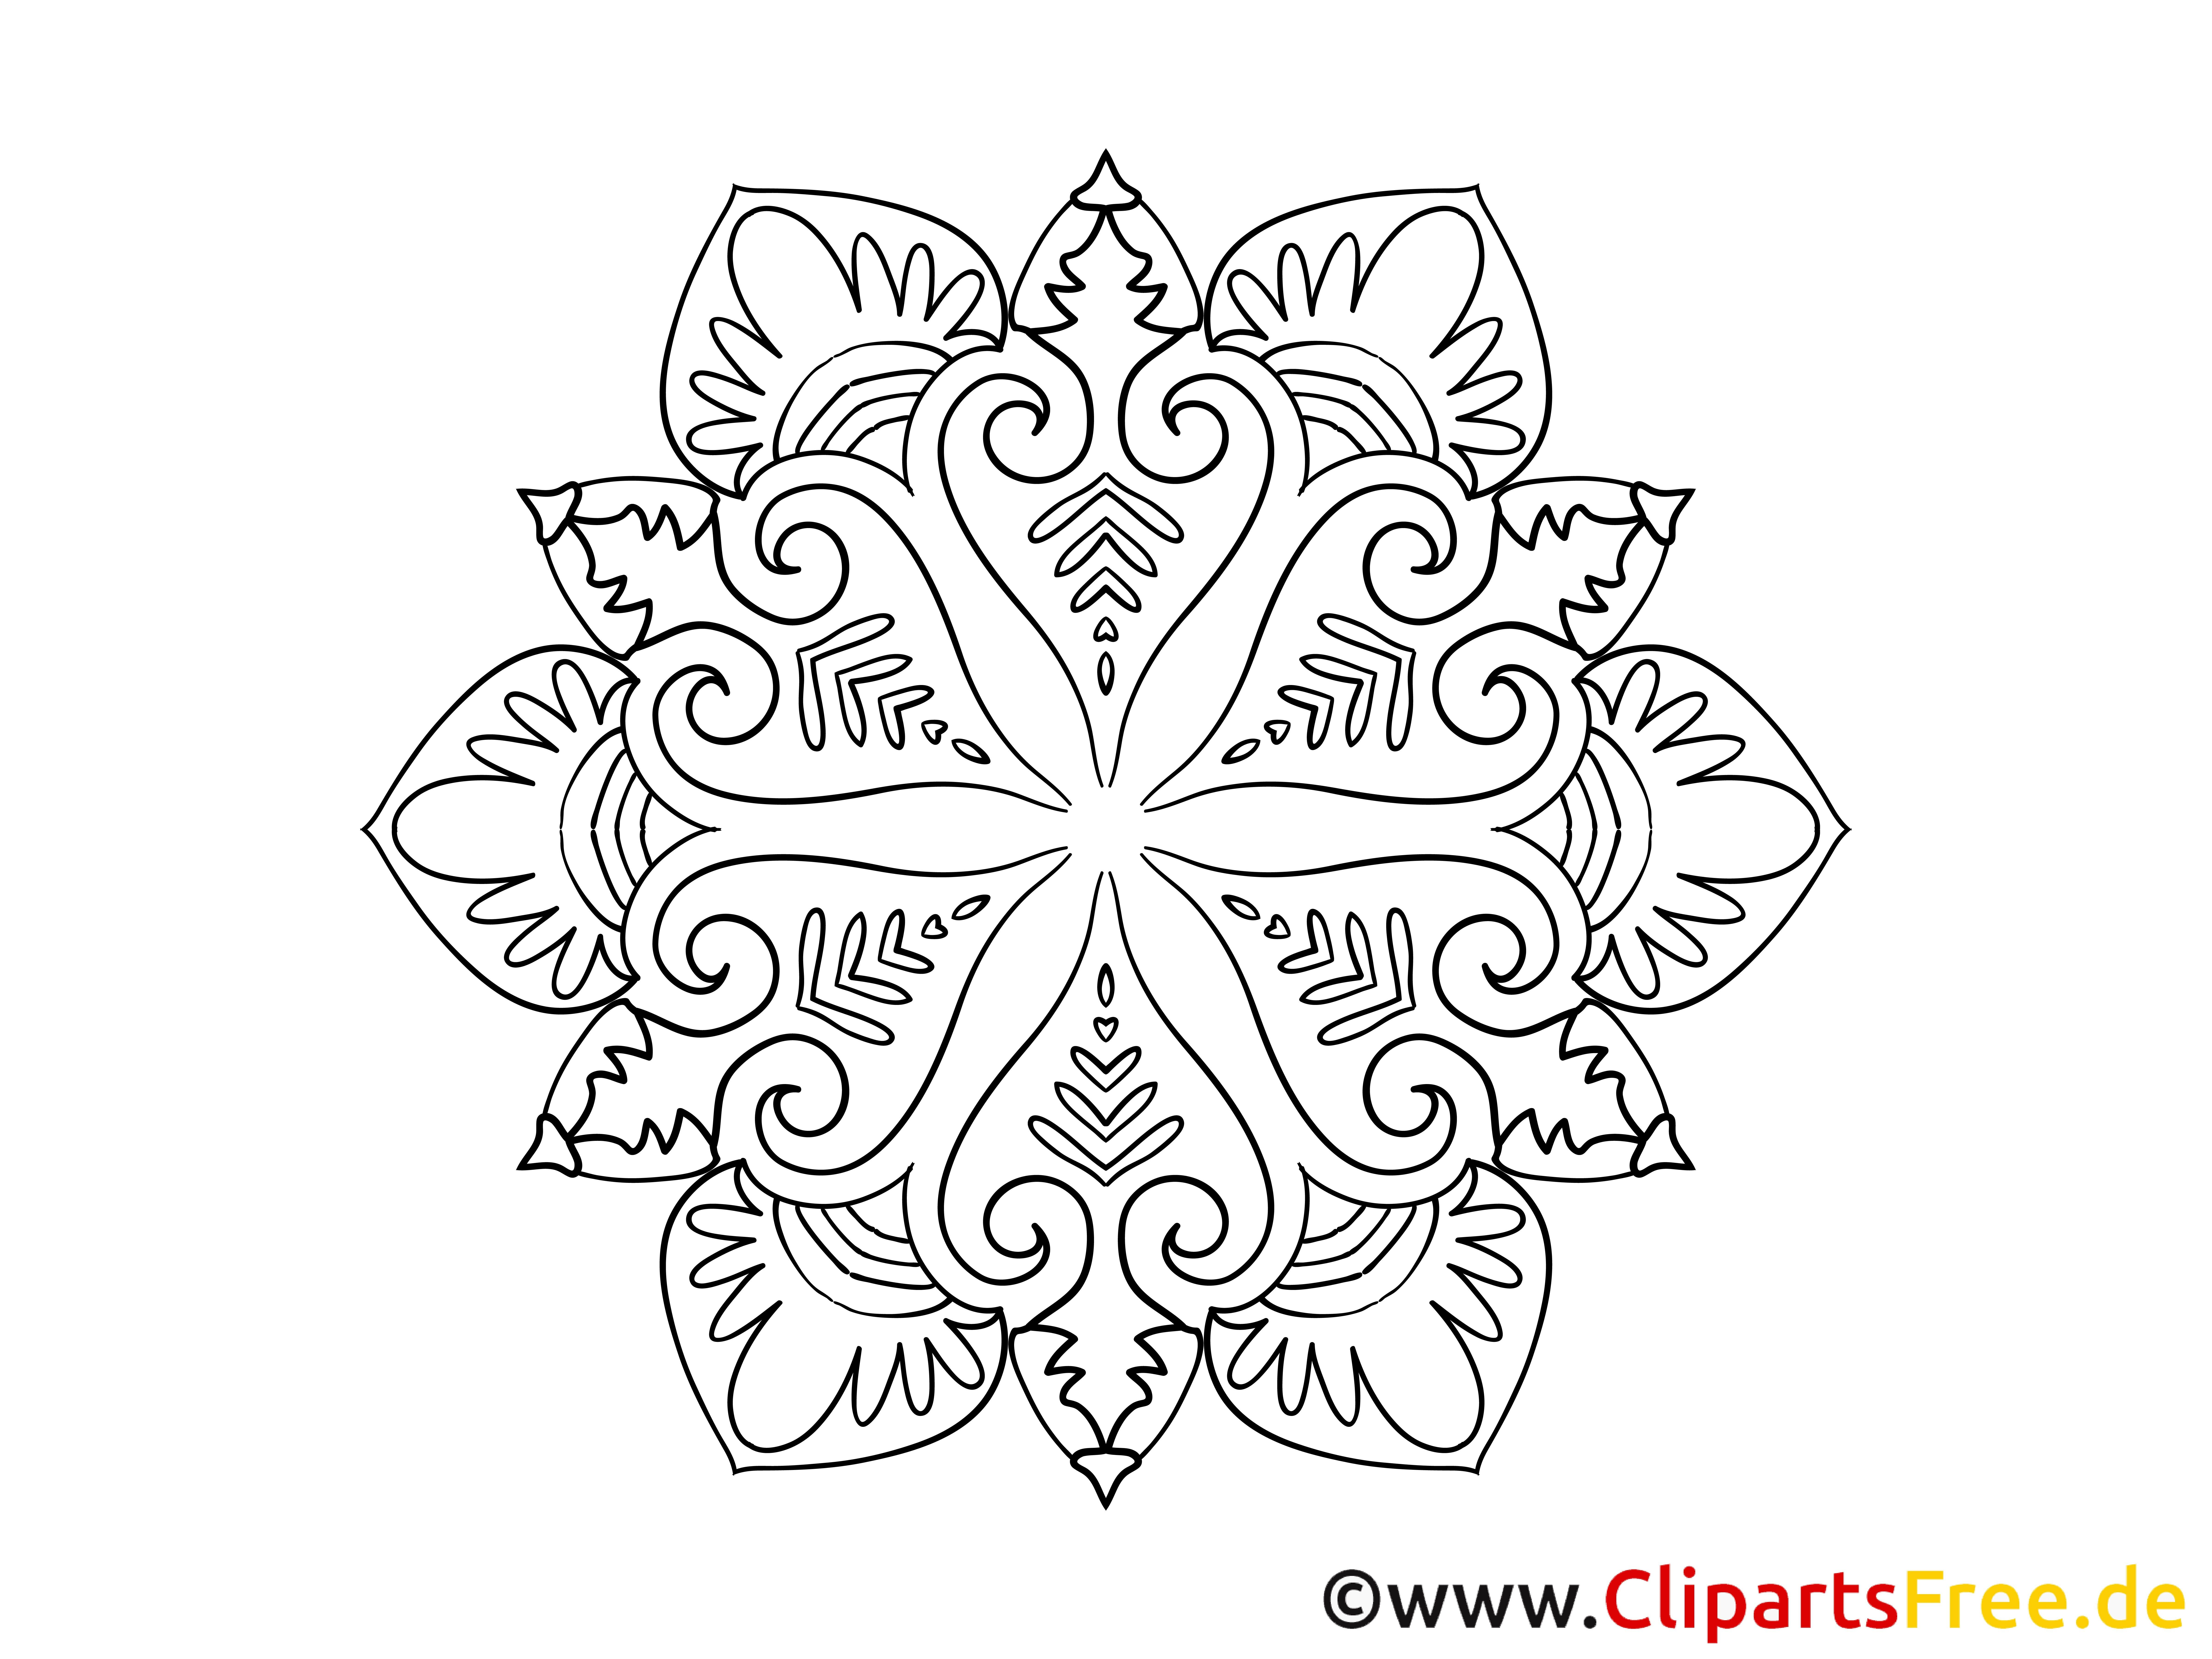 skizze schneeflocke mandala malvorlage zum ausmalen